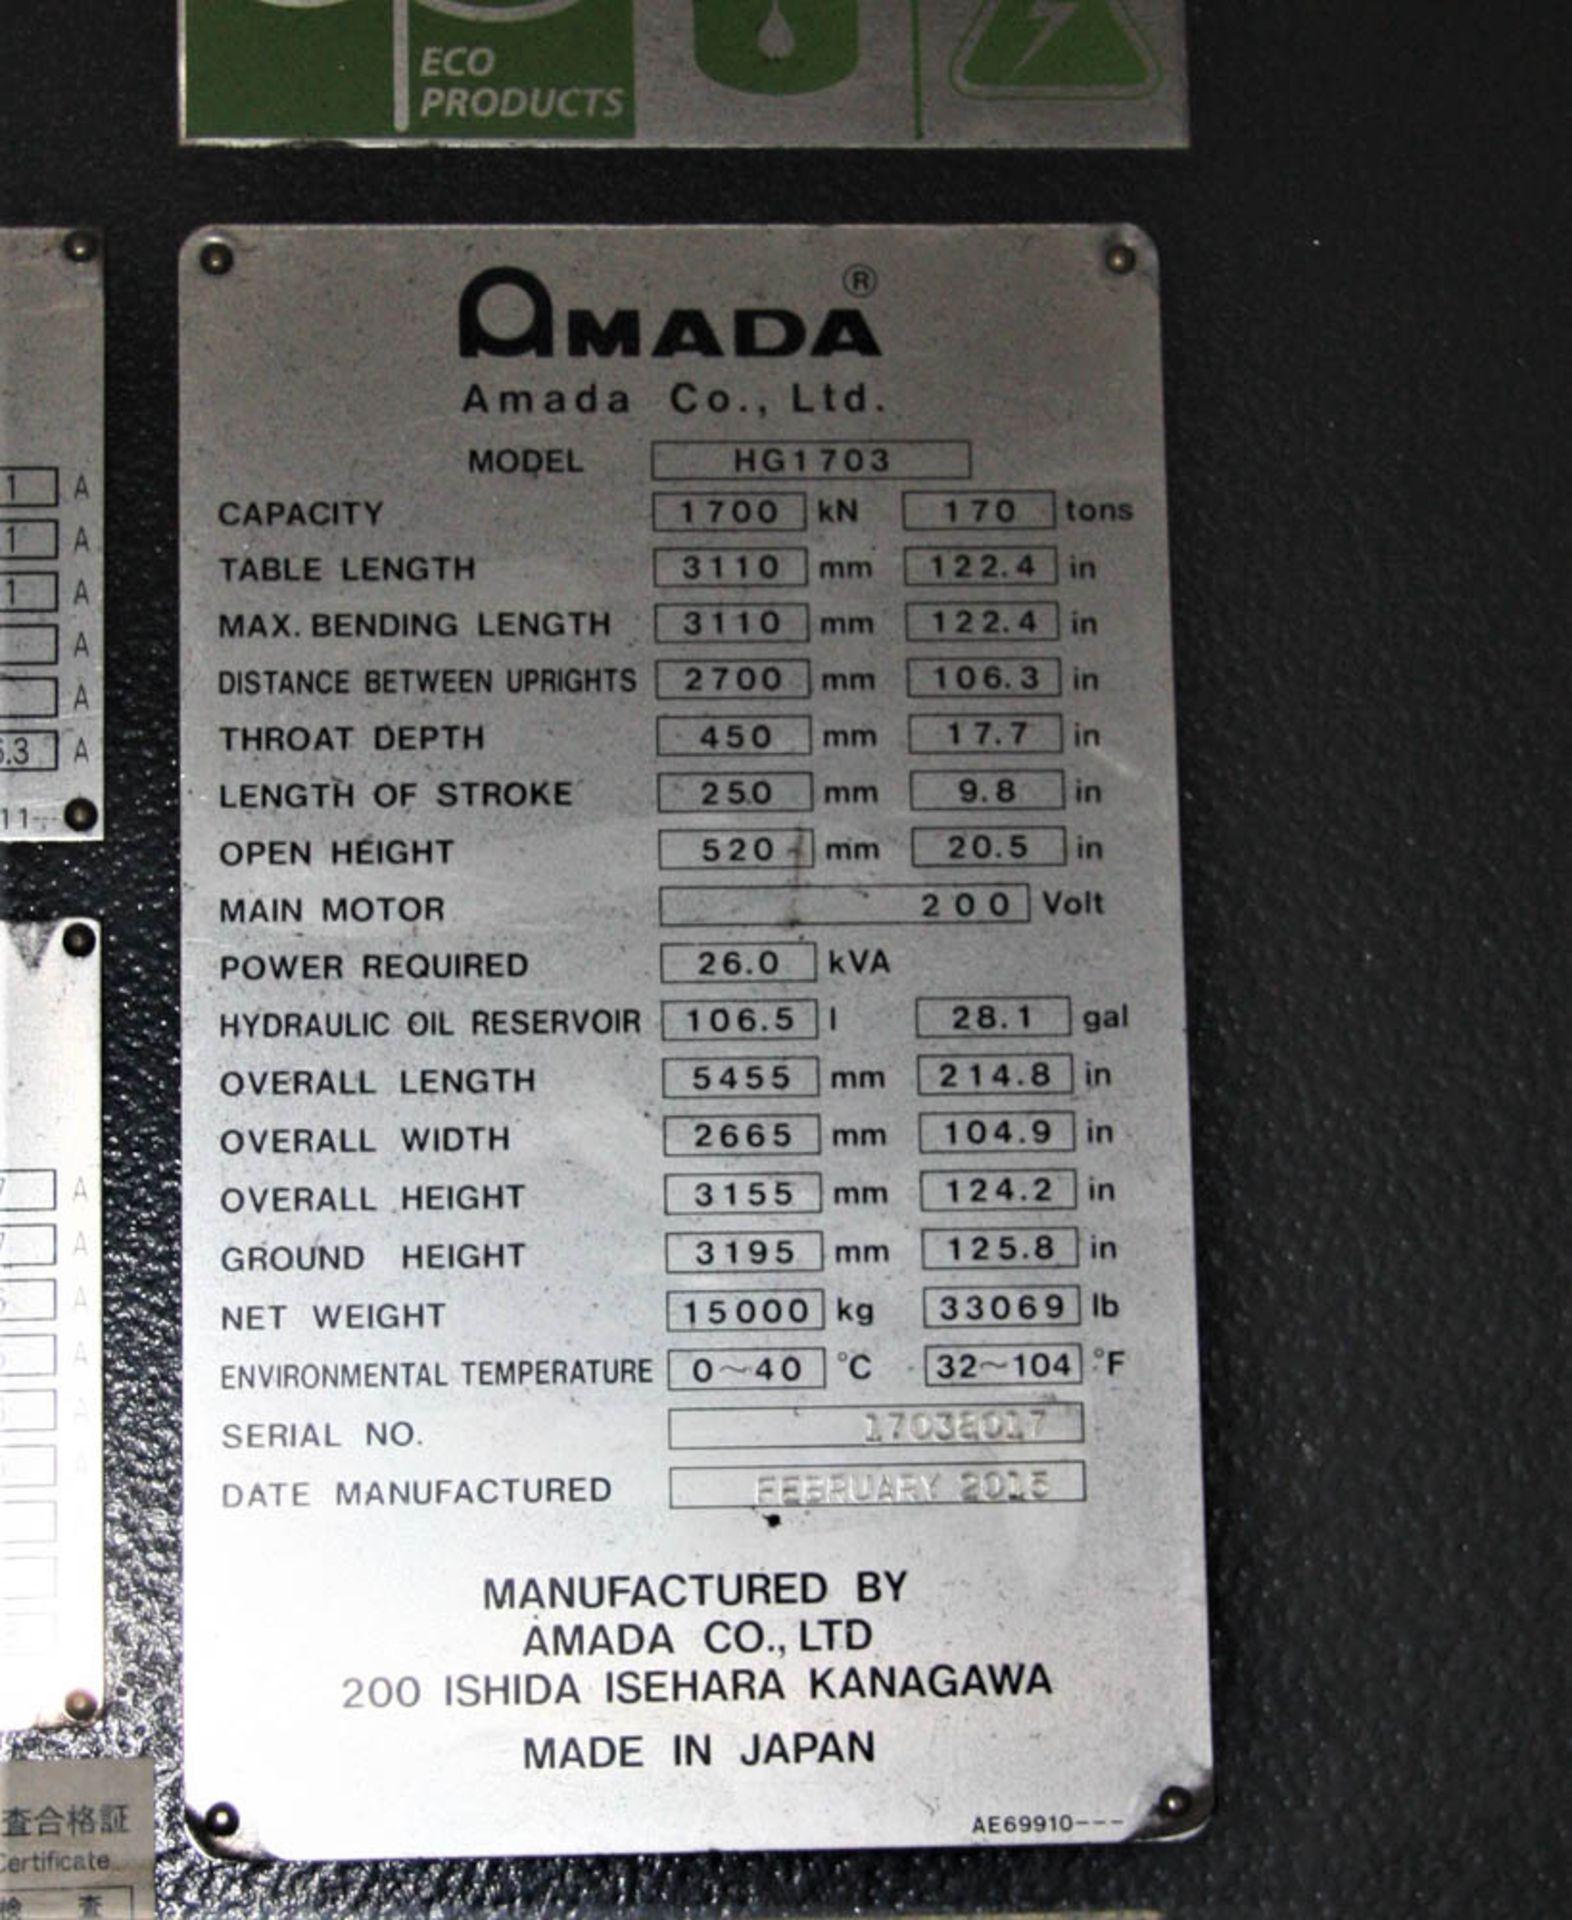 "2015 187 US TON X 122"" AMADA MDL. HG1703 CNC PRESS BRAKE, AMNC 3i CONTROL, 122"" MAX BEND LENGTH - Image 8 of 14"